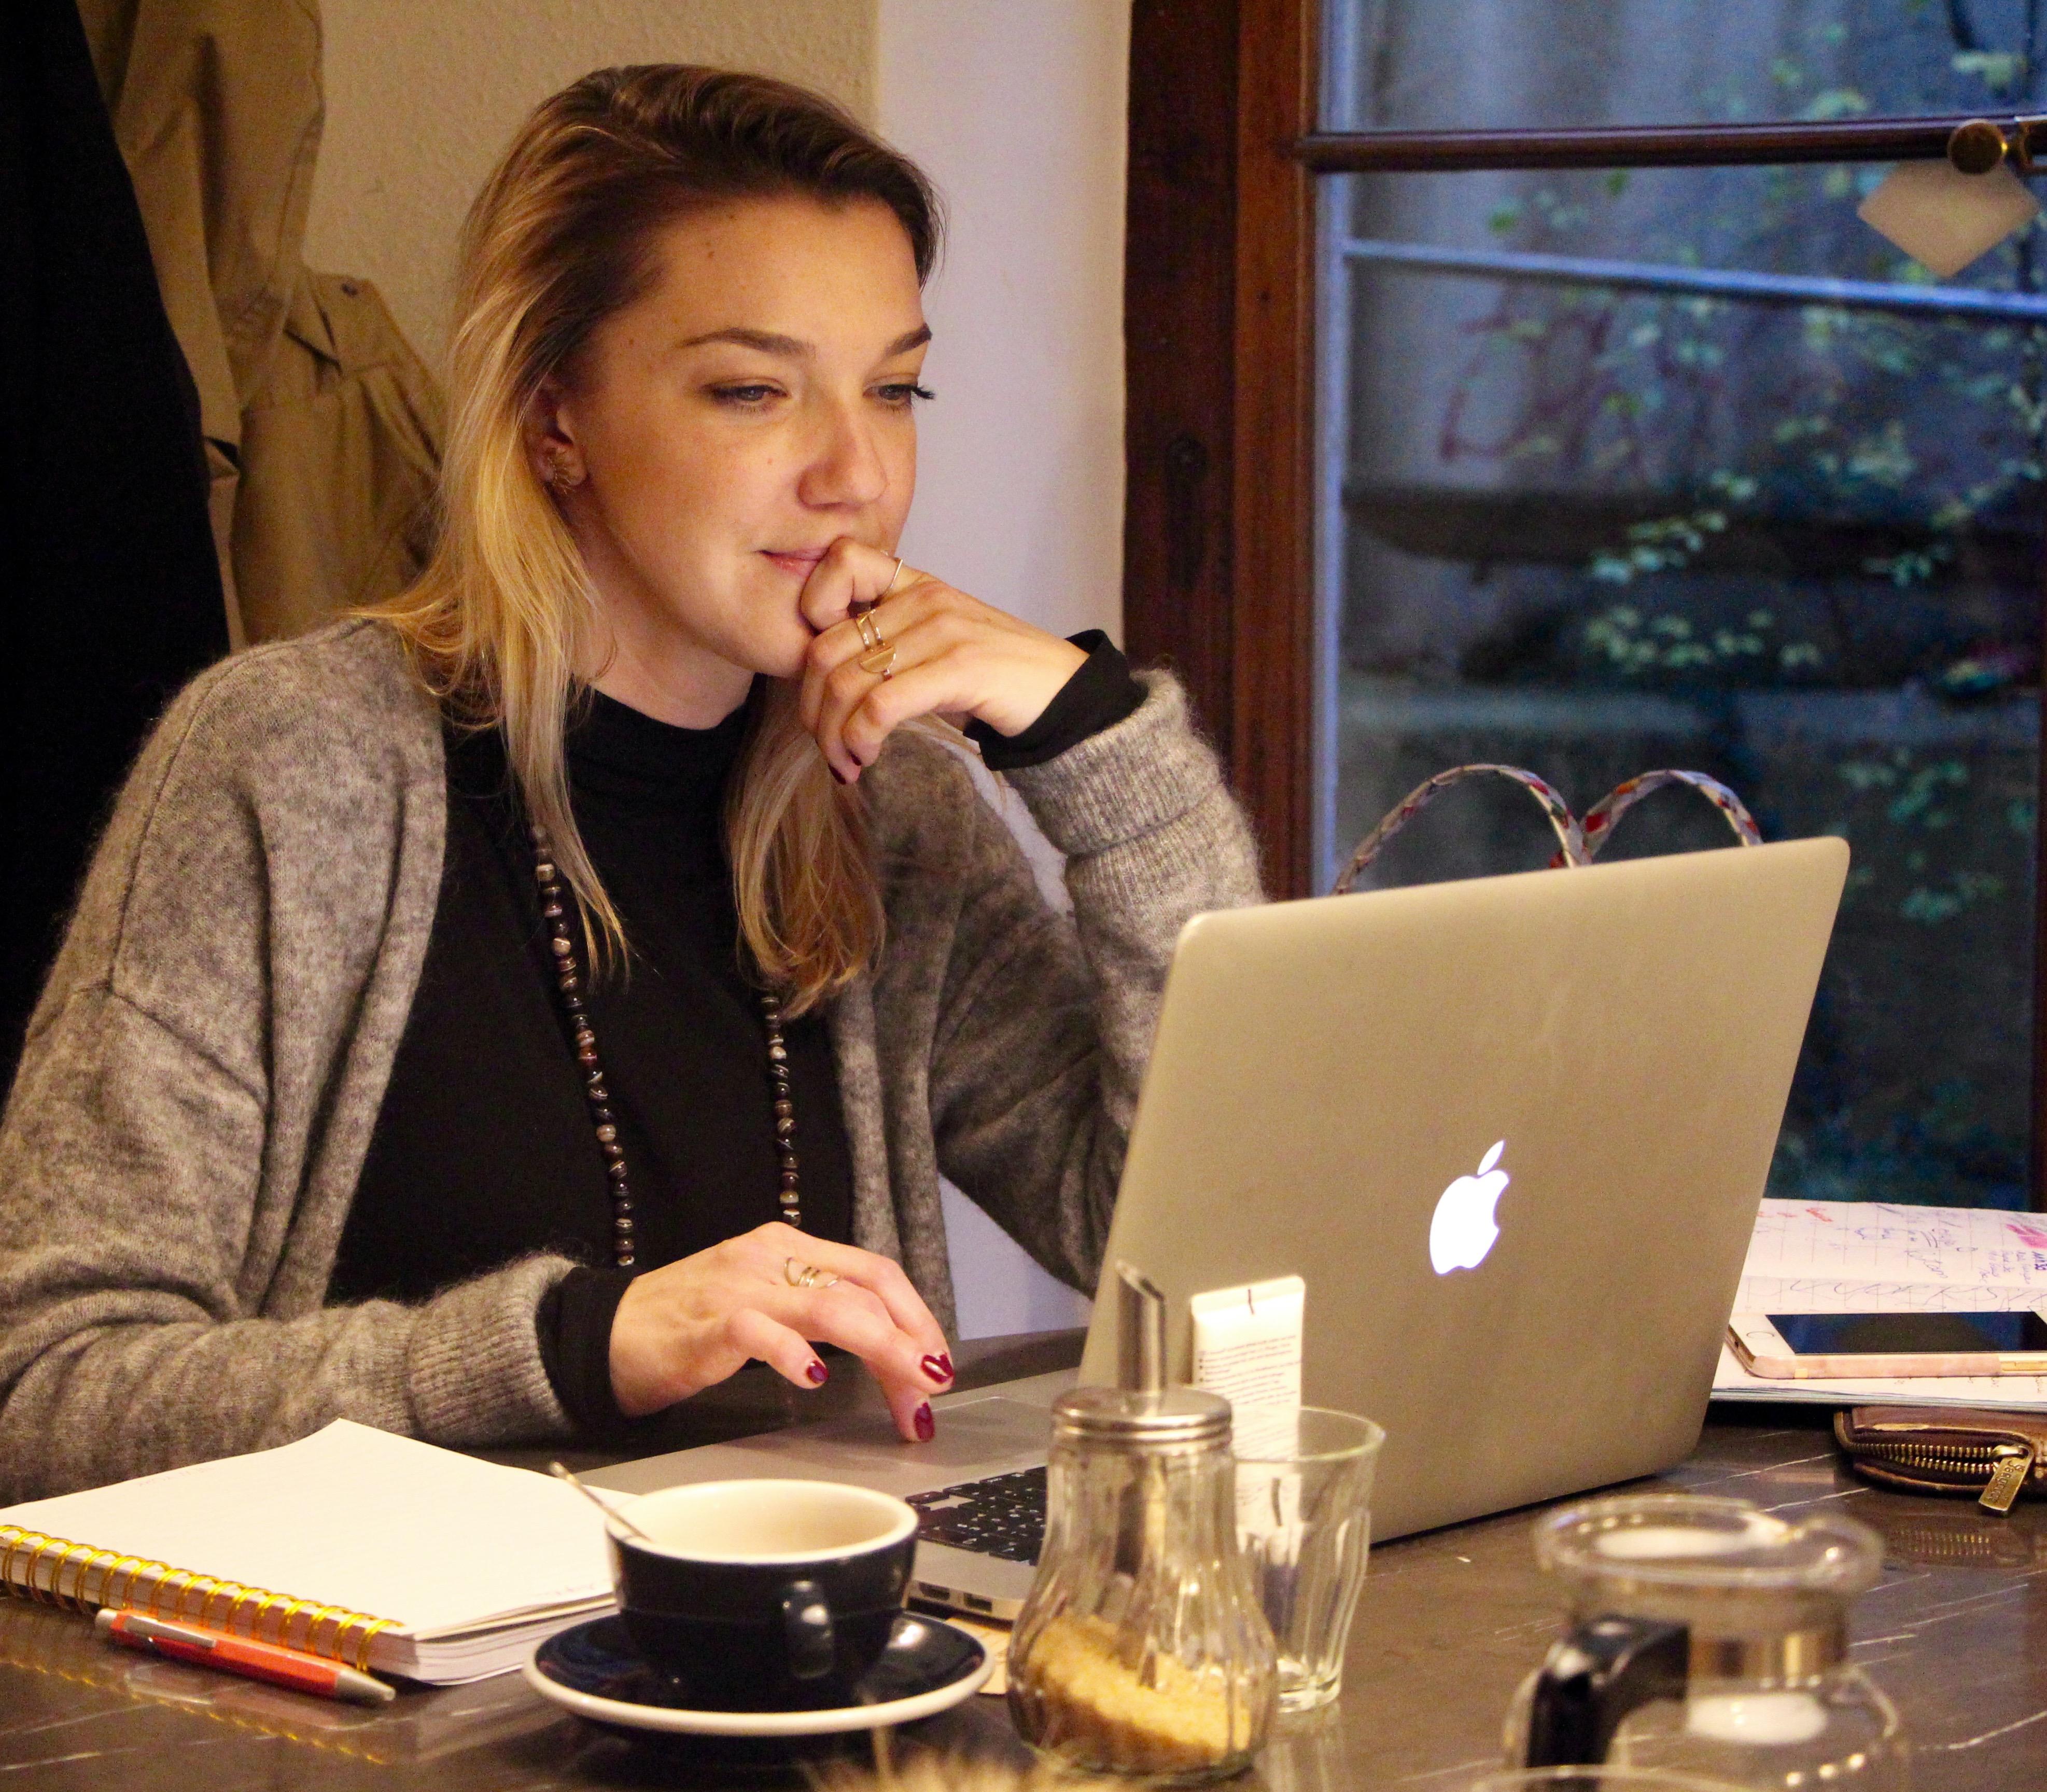 Emilie Hawlena, la fondatrice de Genuine Women ©Eugénie Rousak